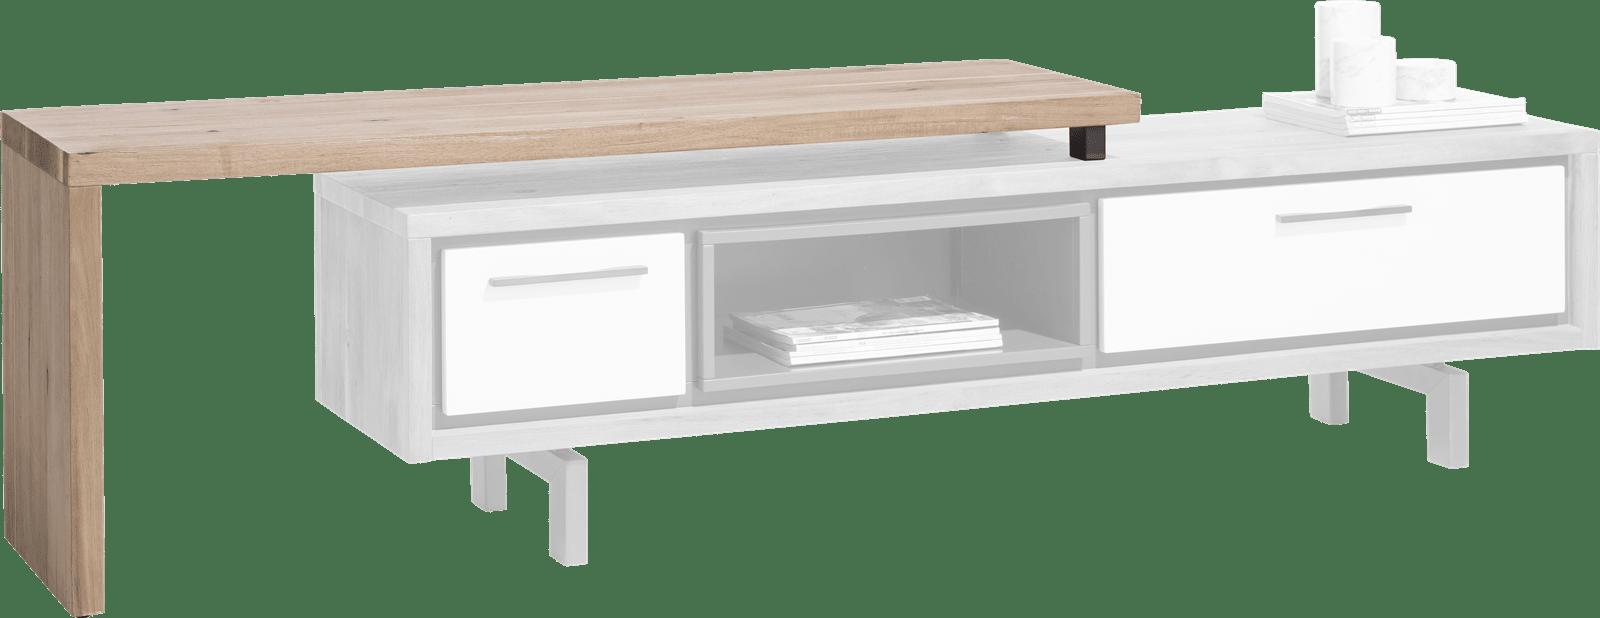 otta meuble tv avec plateau pivotante